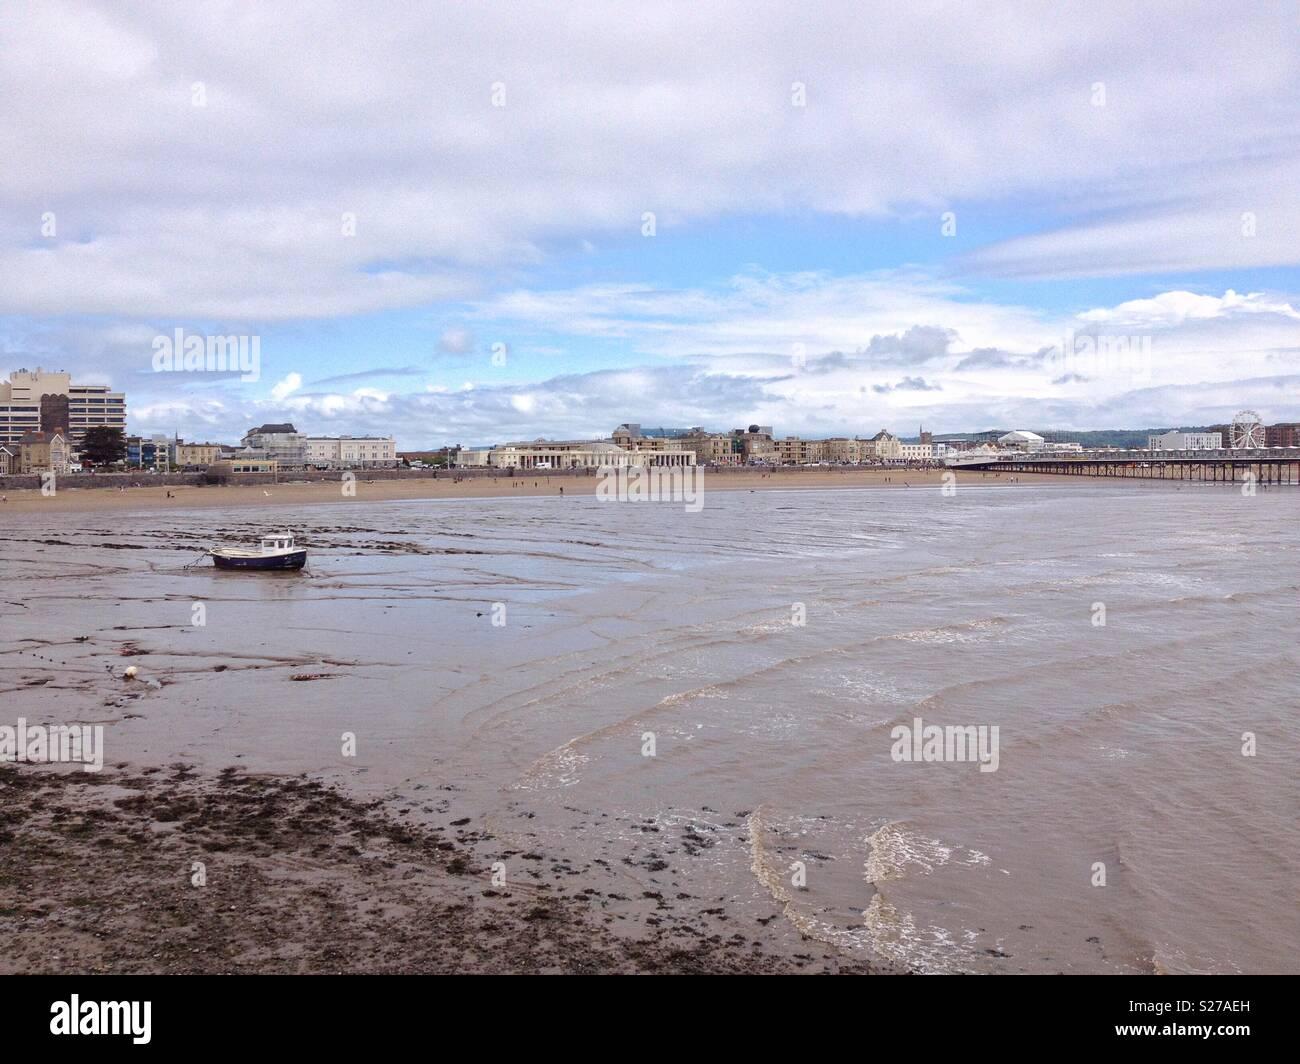 Weston-super-Mare, UK - Stock Image